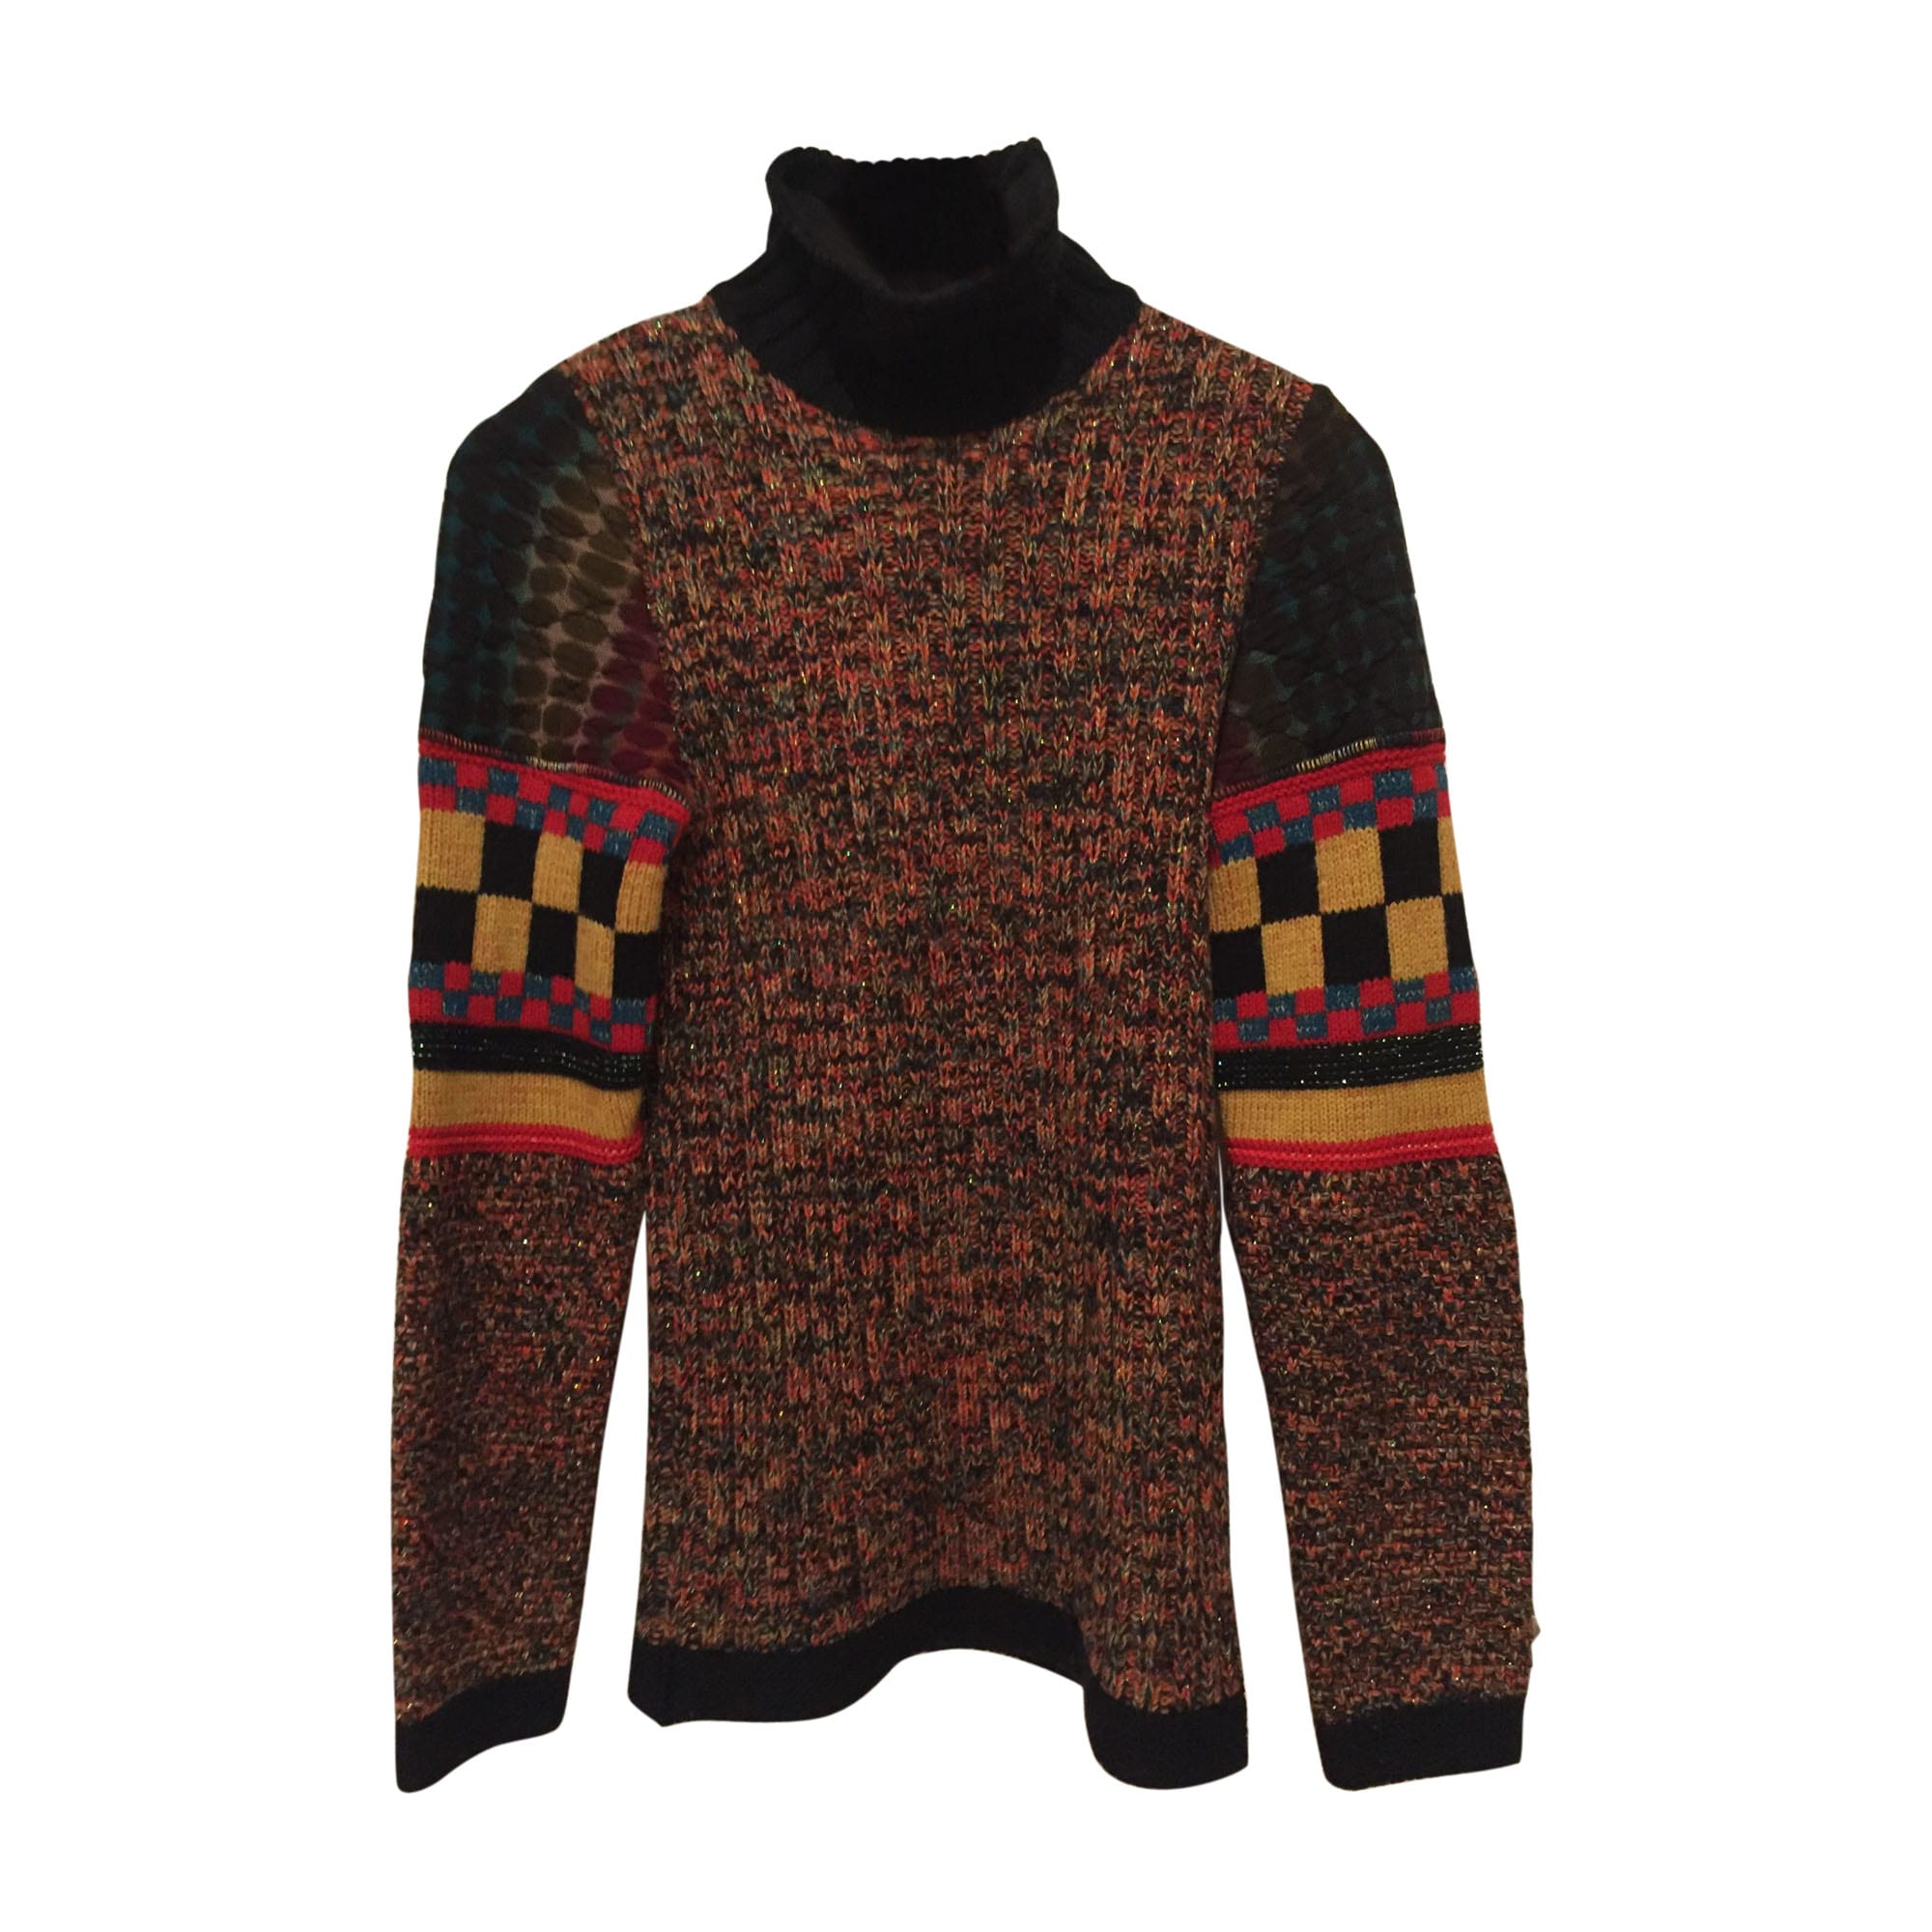 Sweatshirt JEAN PAUL GAULTIER MAILLE Multicolor